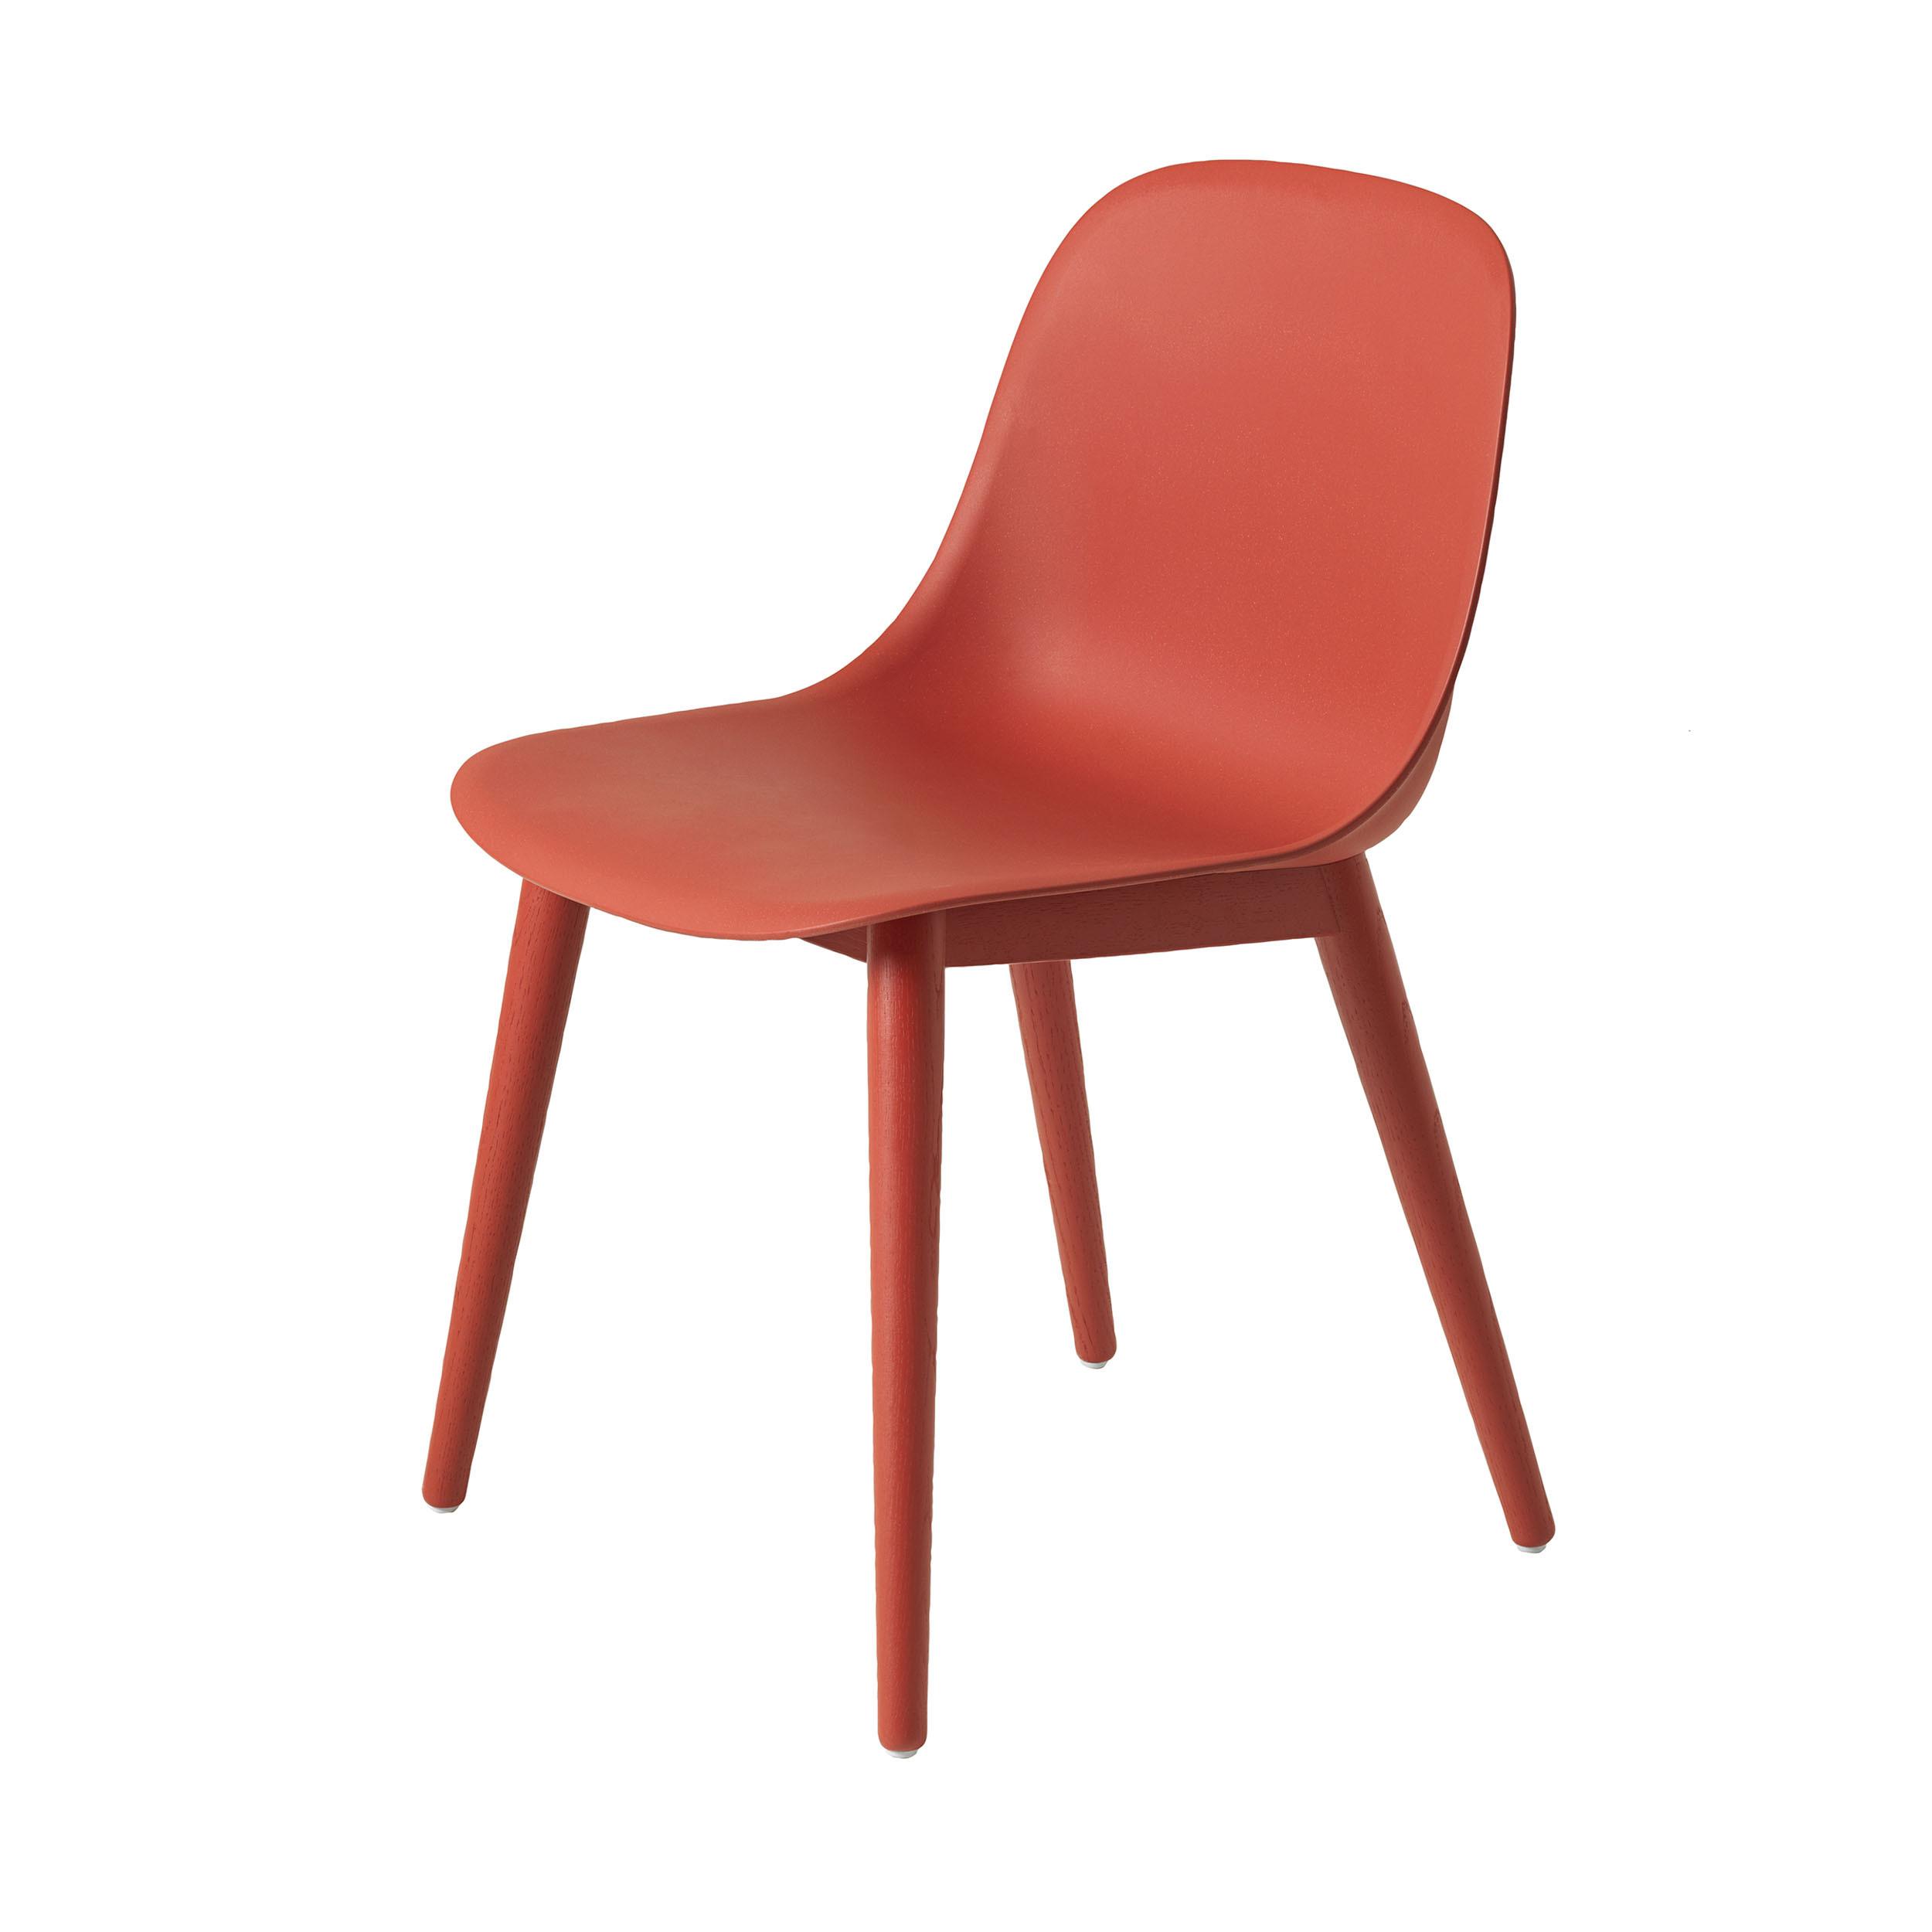 fiber stuhl rot online kaufen bei woonio. Black Bedroom Furniture Sets. Home Design Ideas